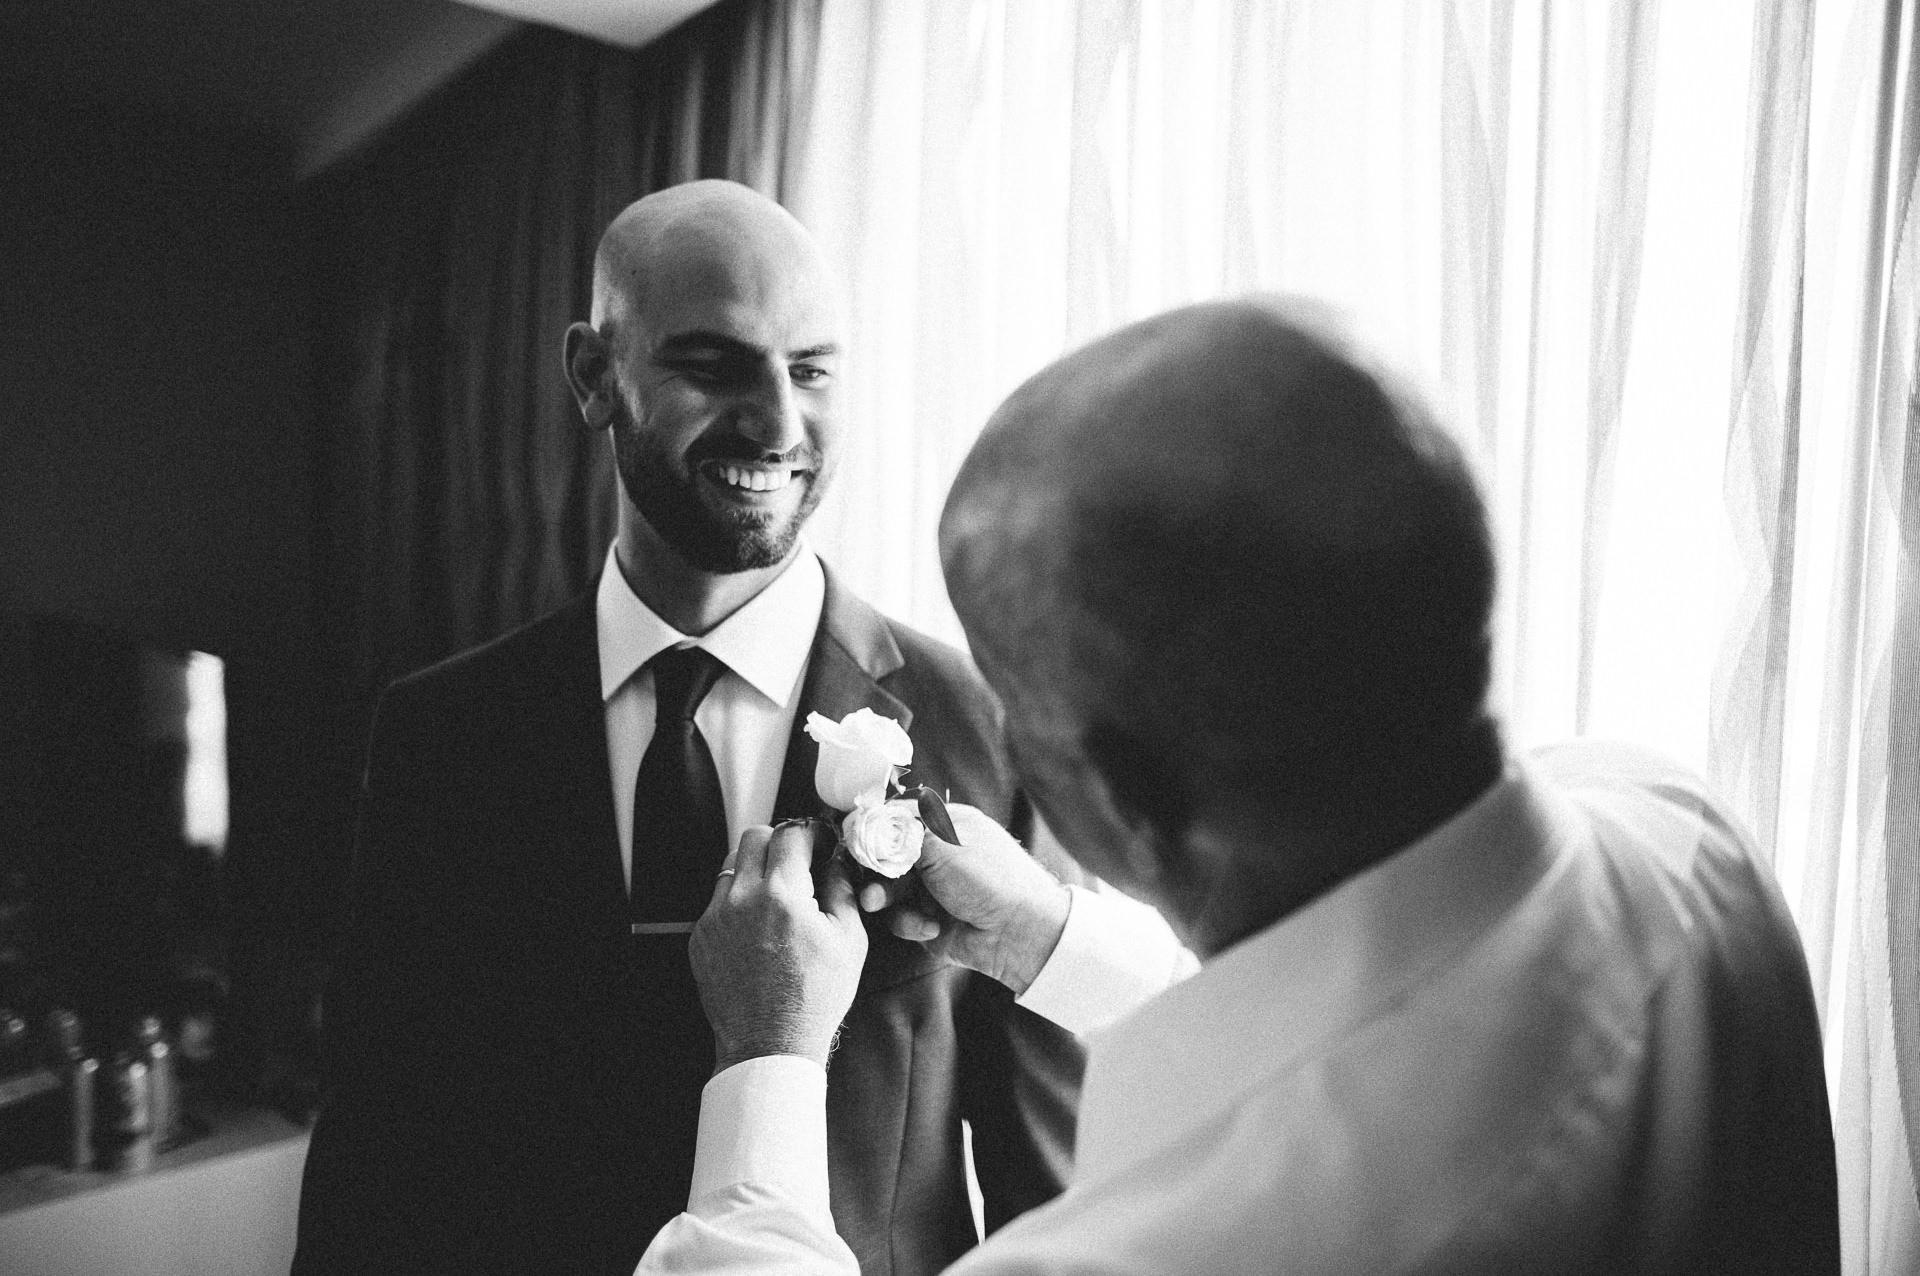 Dowtown Hilton Cleveland Wedding Photographer 1 12.jpg